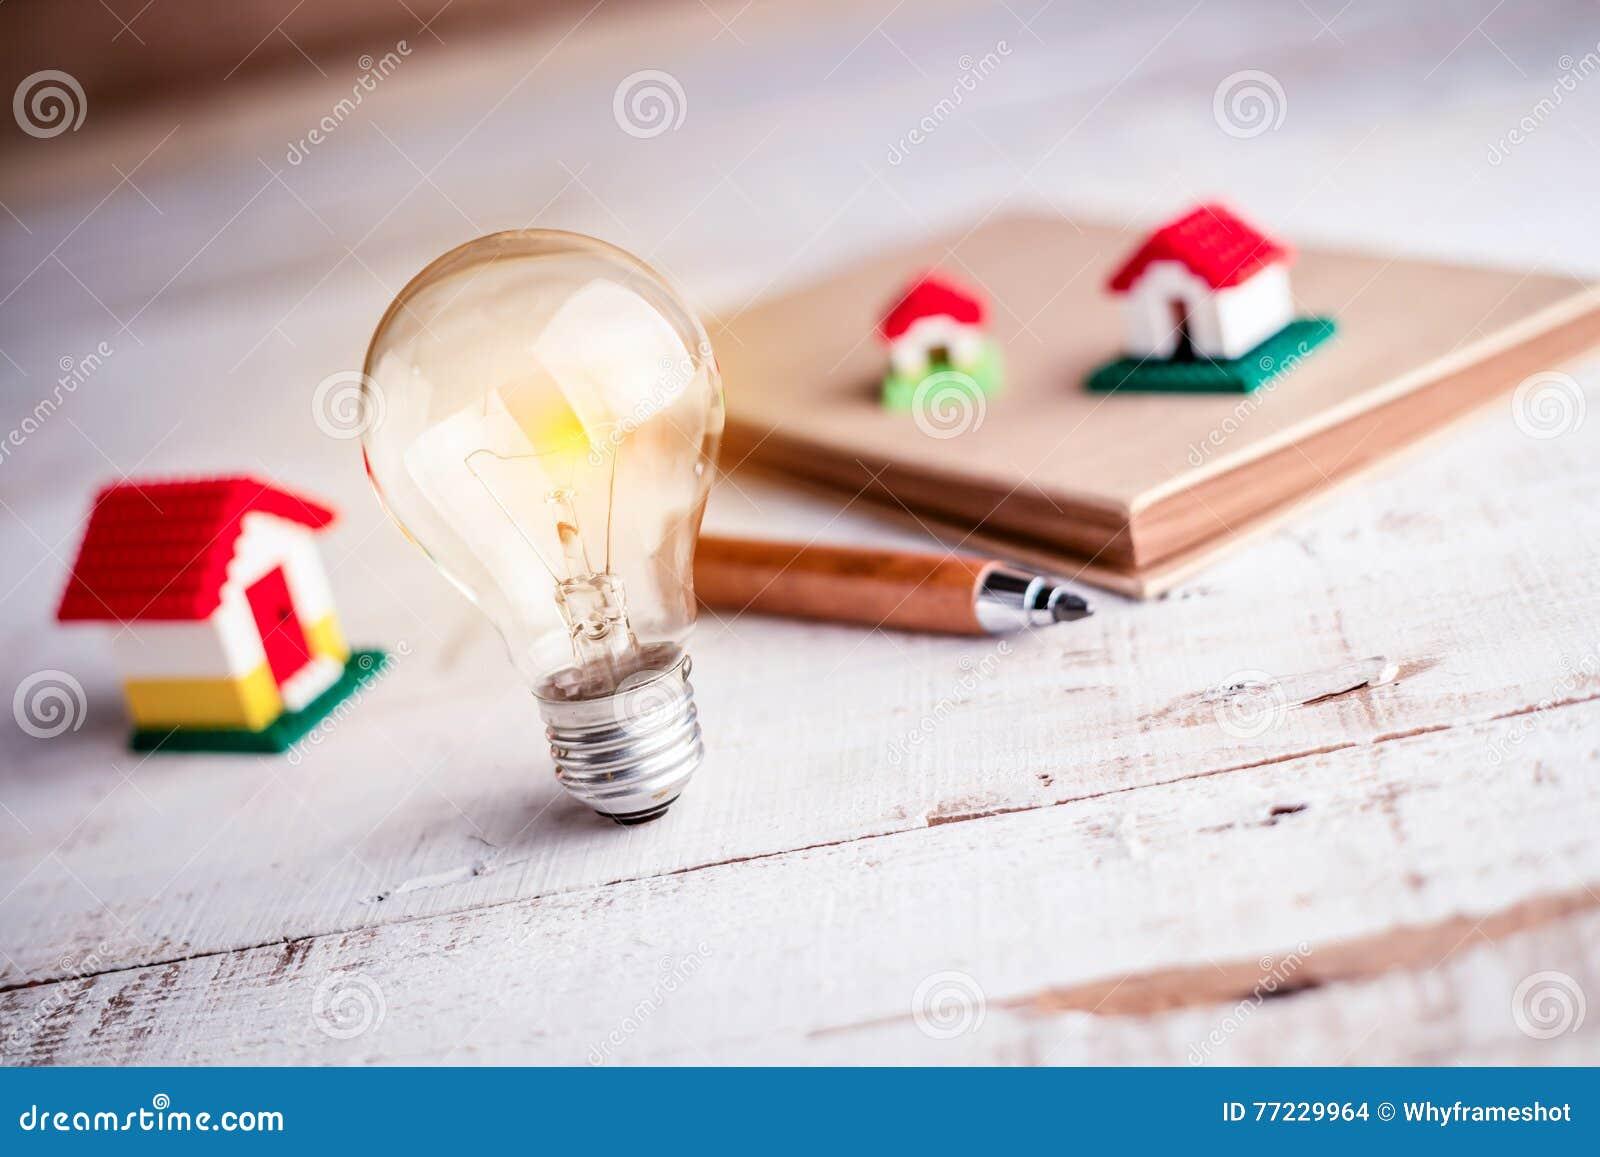 Light bulb and house model